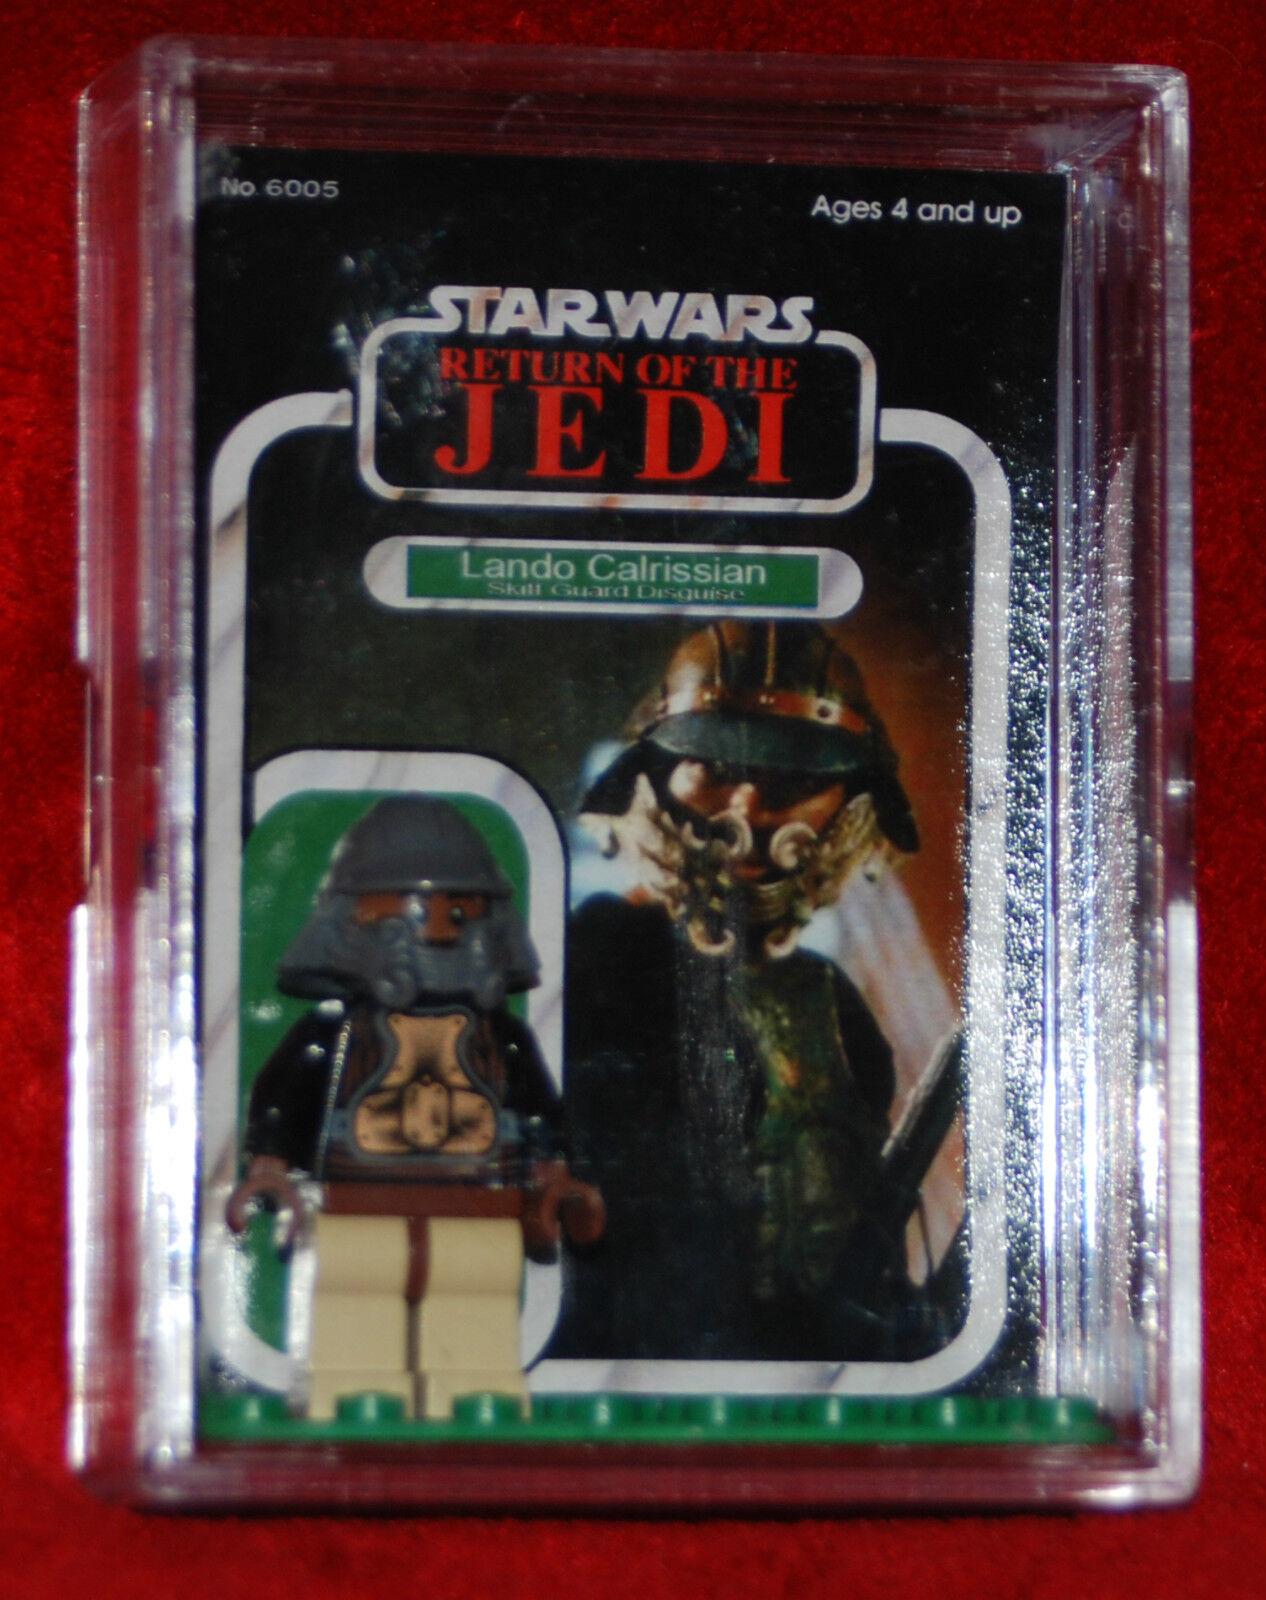 Lego Lando Calrissian nuevo caso de tarjeta Personalizada STARWARS Minifigura Star Wars